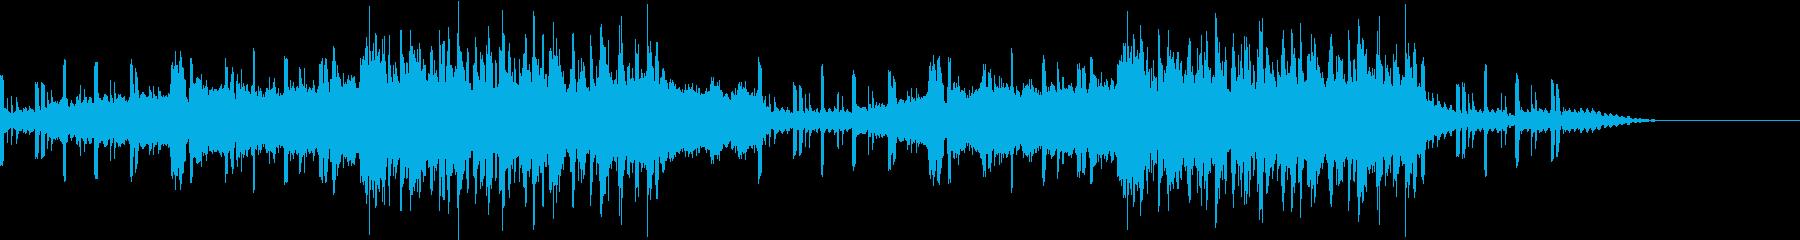 BGM_ポップの再生済みの波形